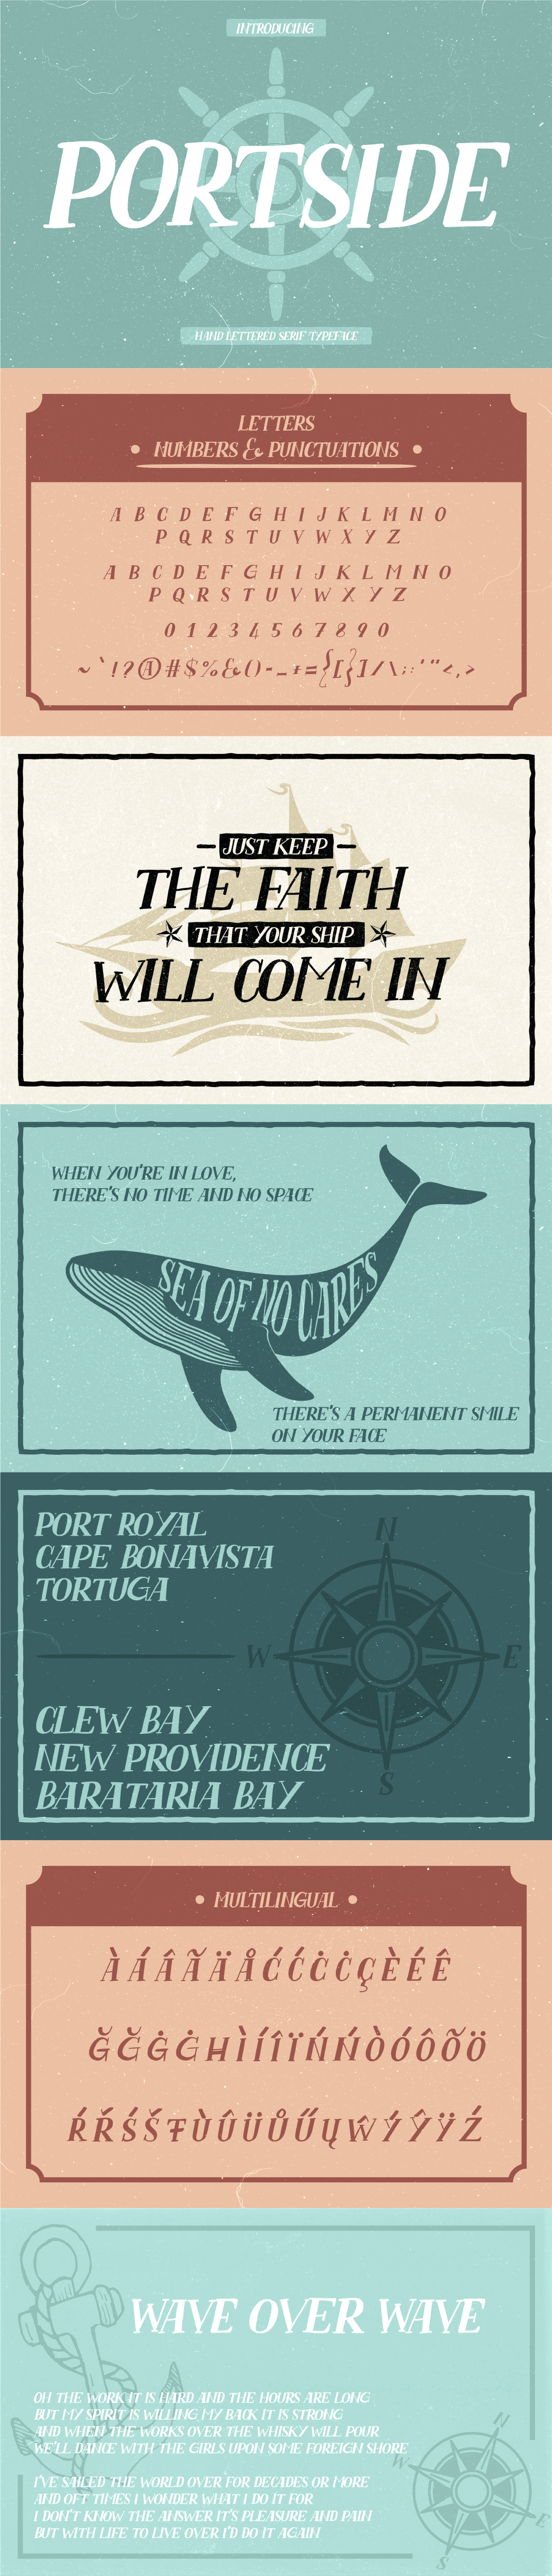 free Free font free fonts freebie hand drawn nautical rustic Sea Shanty serif vintage